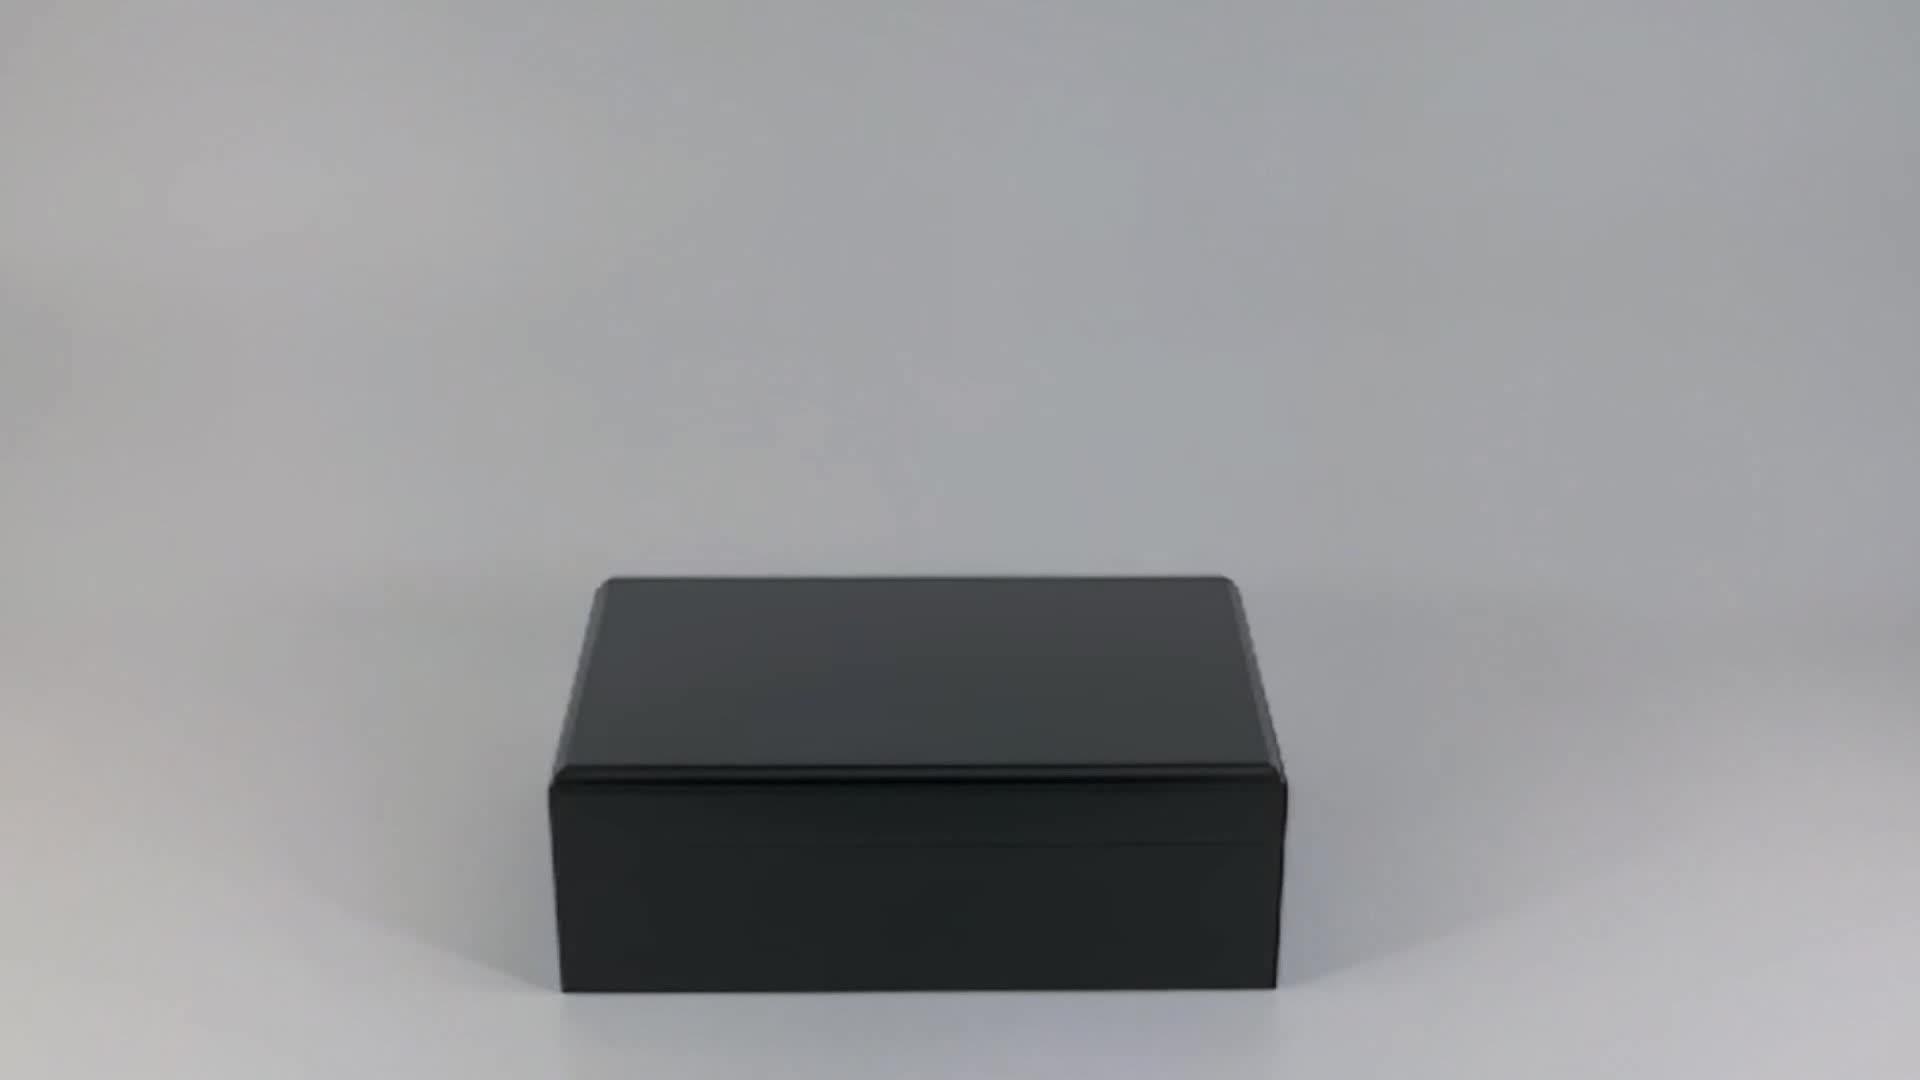 Sonny Humidor Set Black Matte Lacquer Wooden Seal Cigar Box